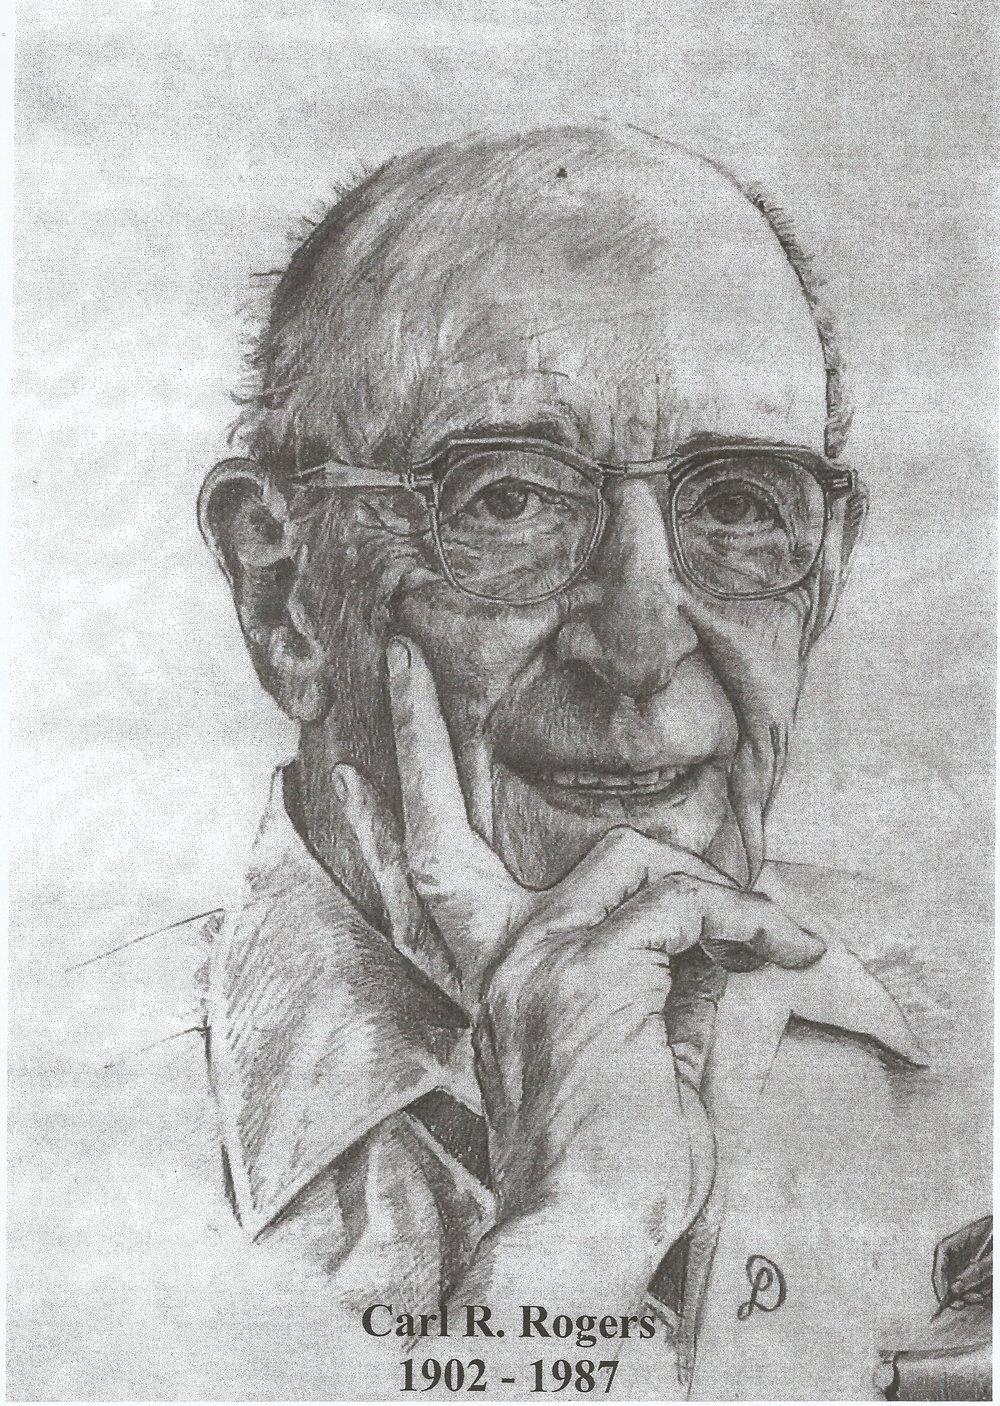 Carl R. Rogers, 1902 - 1987